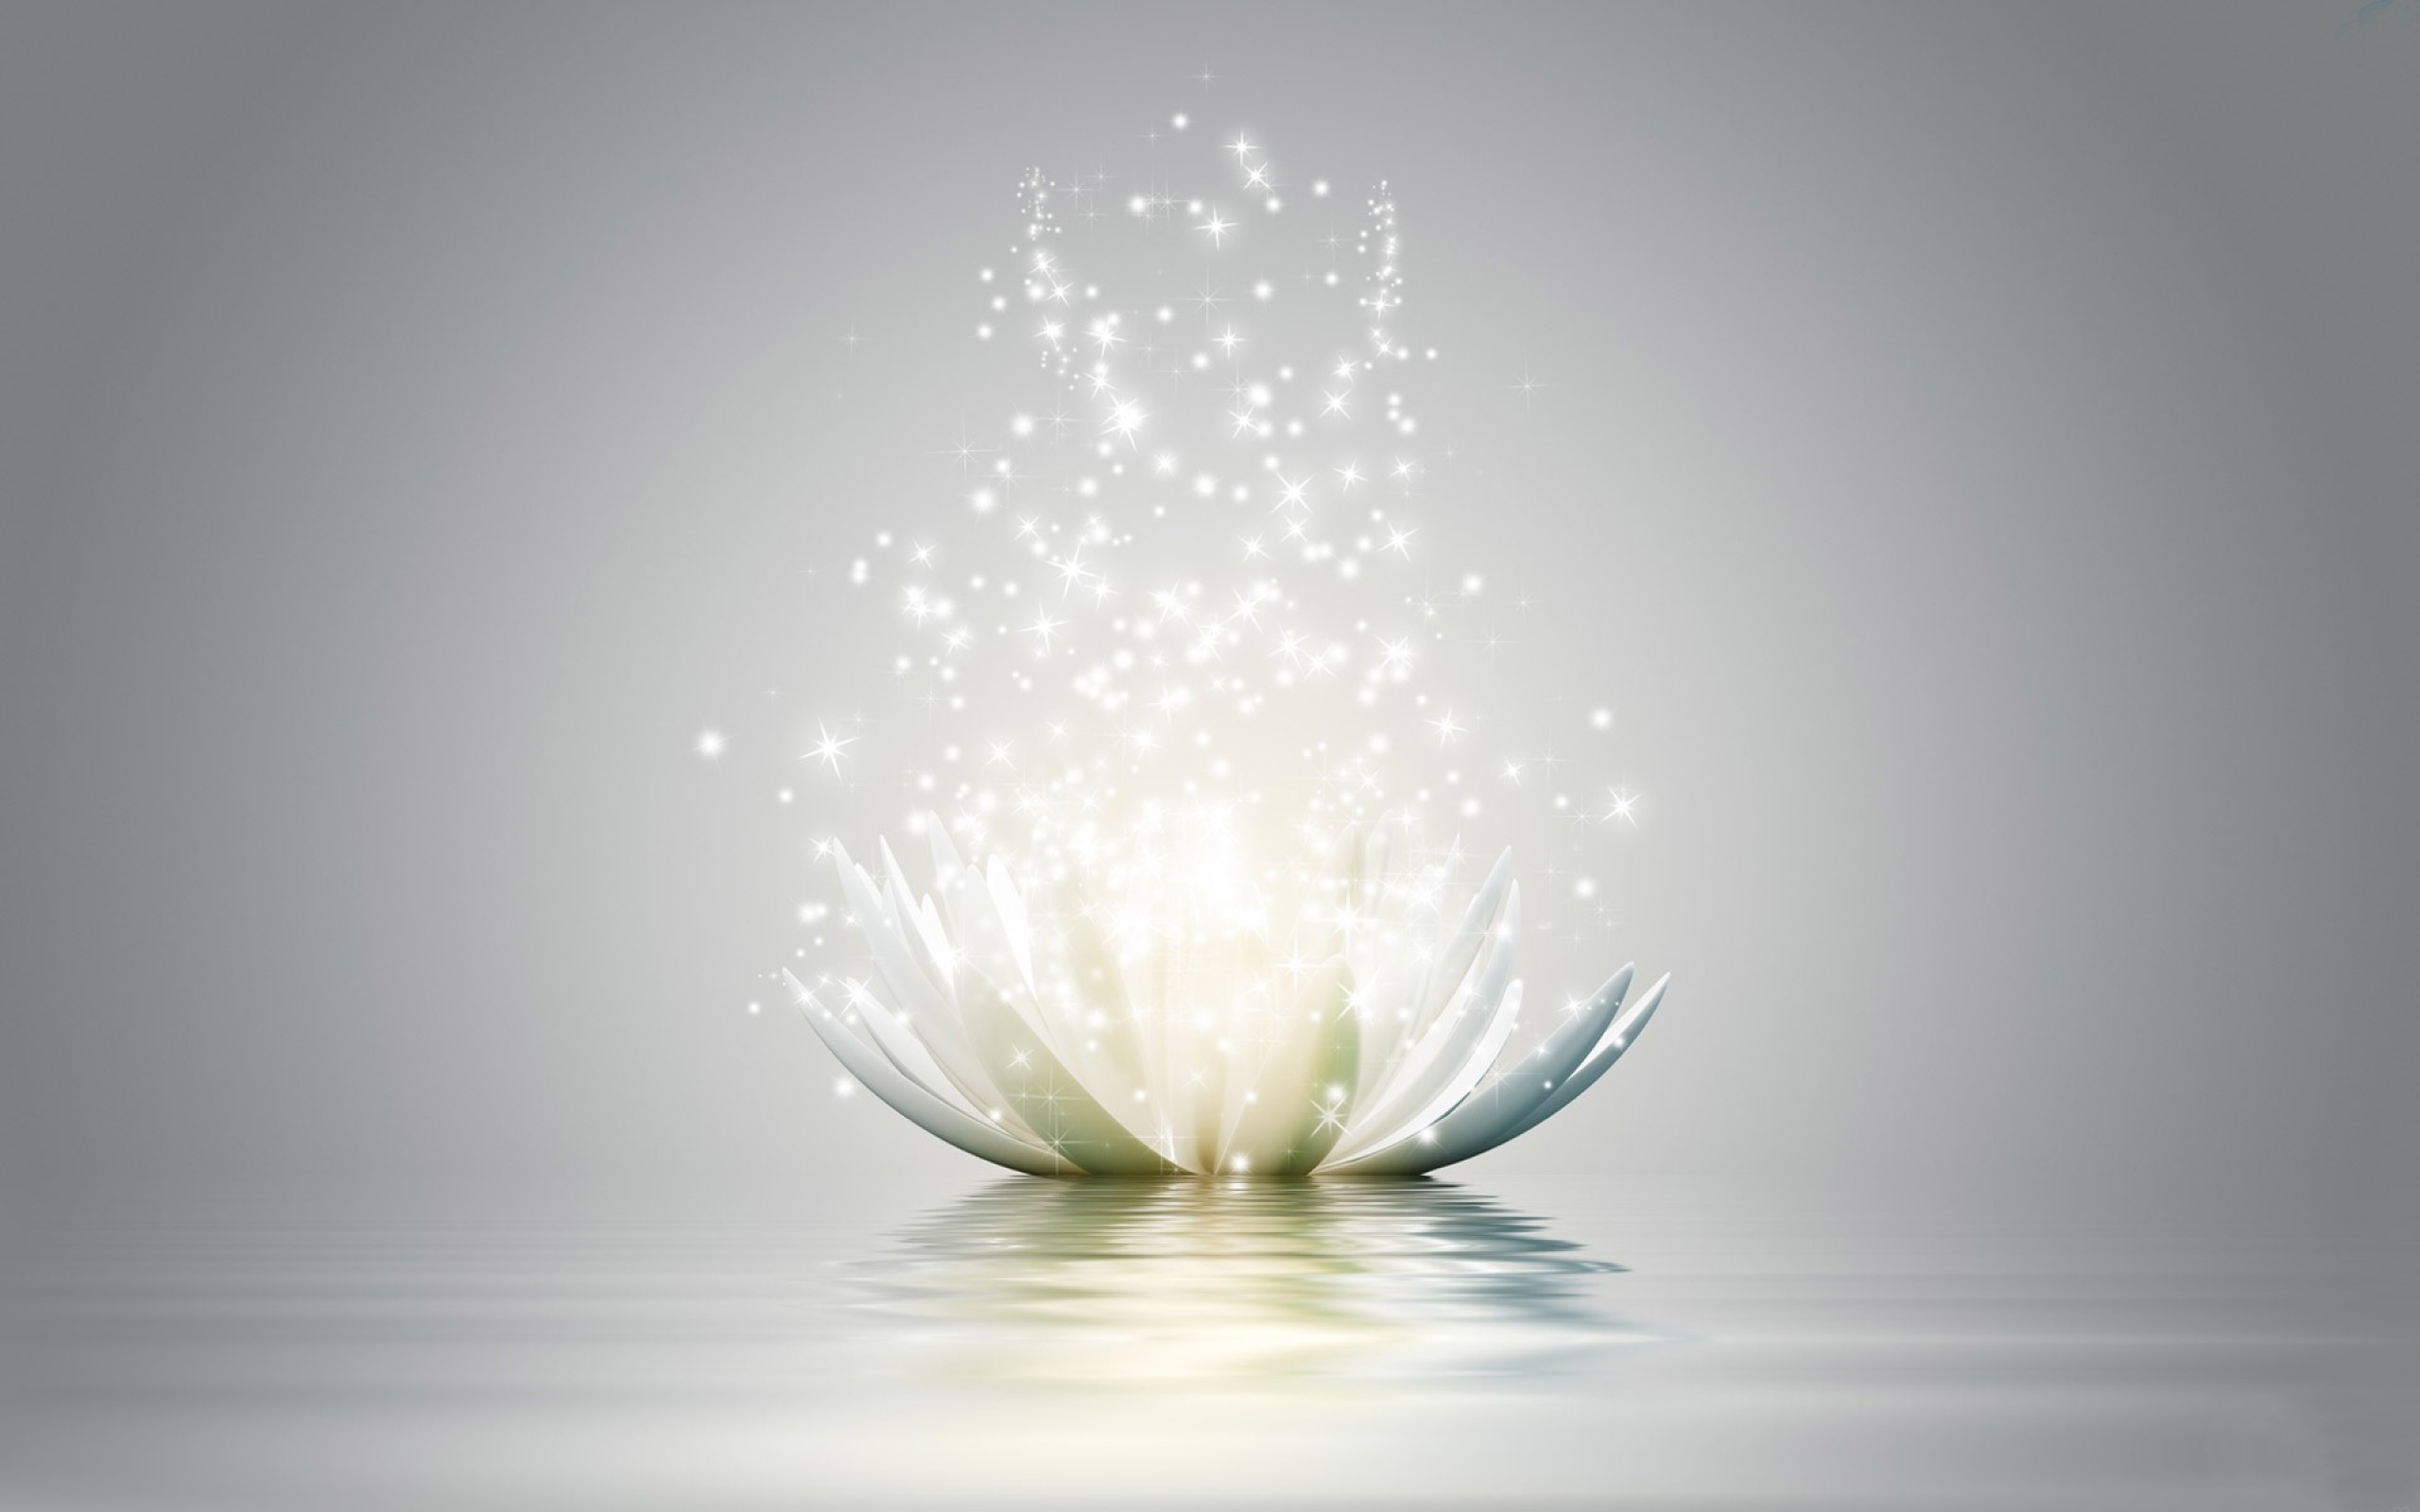 Lotus flower hd wallpaper background image 2560x1600 id727579 lotus flower hd wallpaper background image 2560x1600 id727579 wallpaper abyss izmirmasajfo